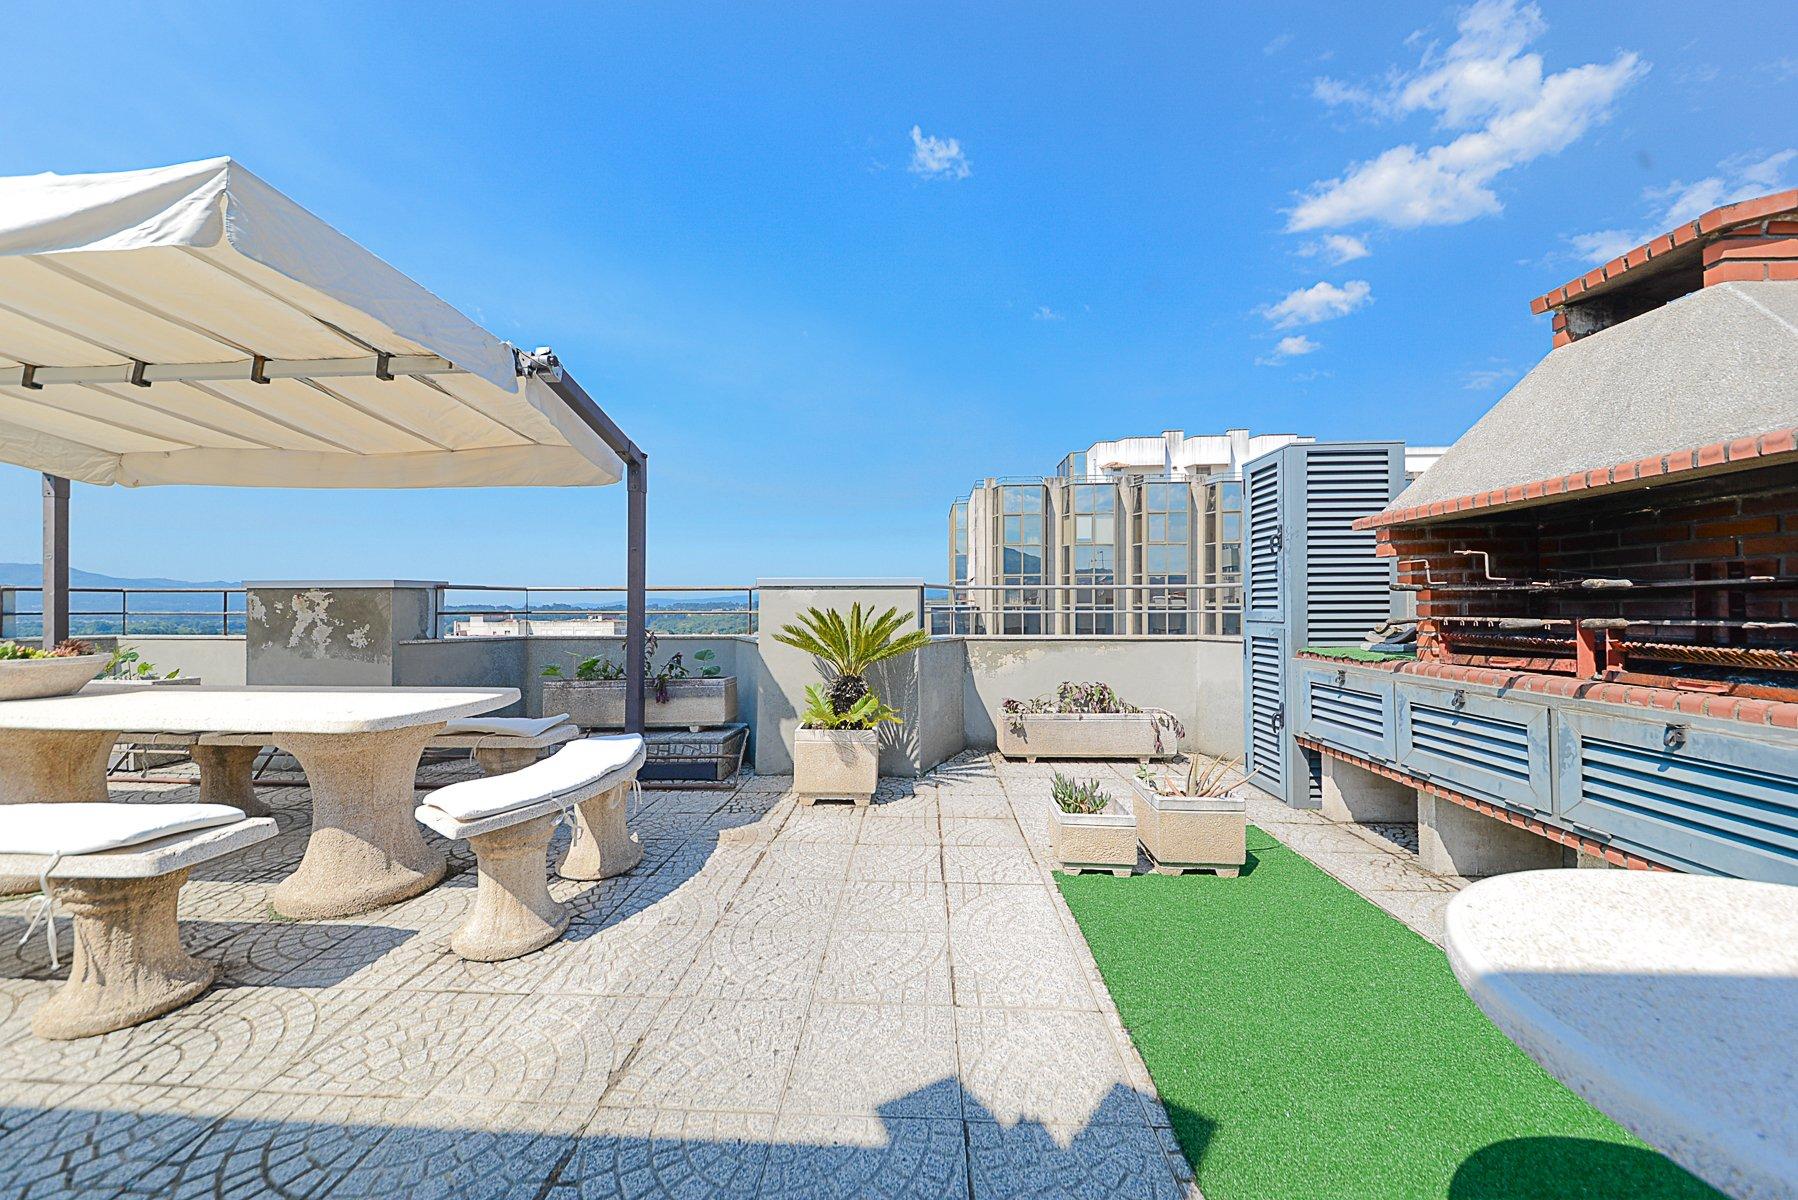 5 Bedroom Apartment Valenca, Porto Ref: AAP73